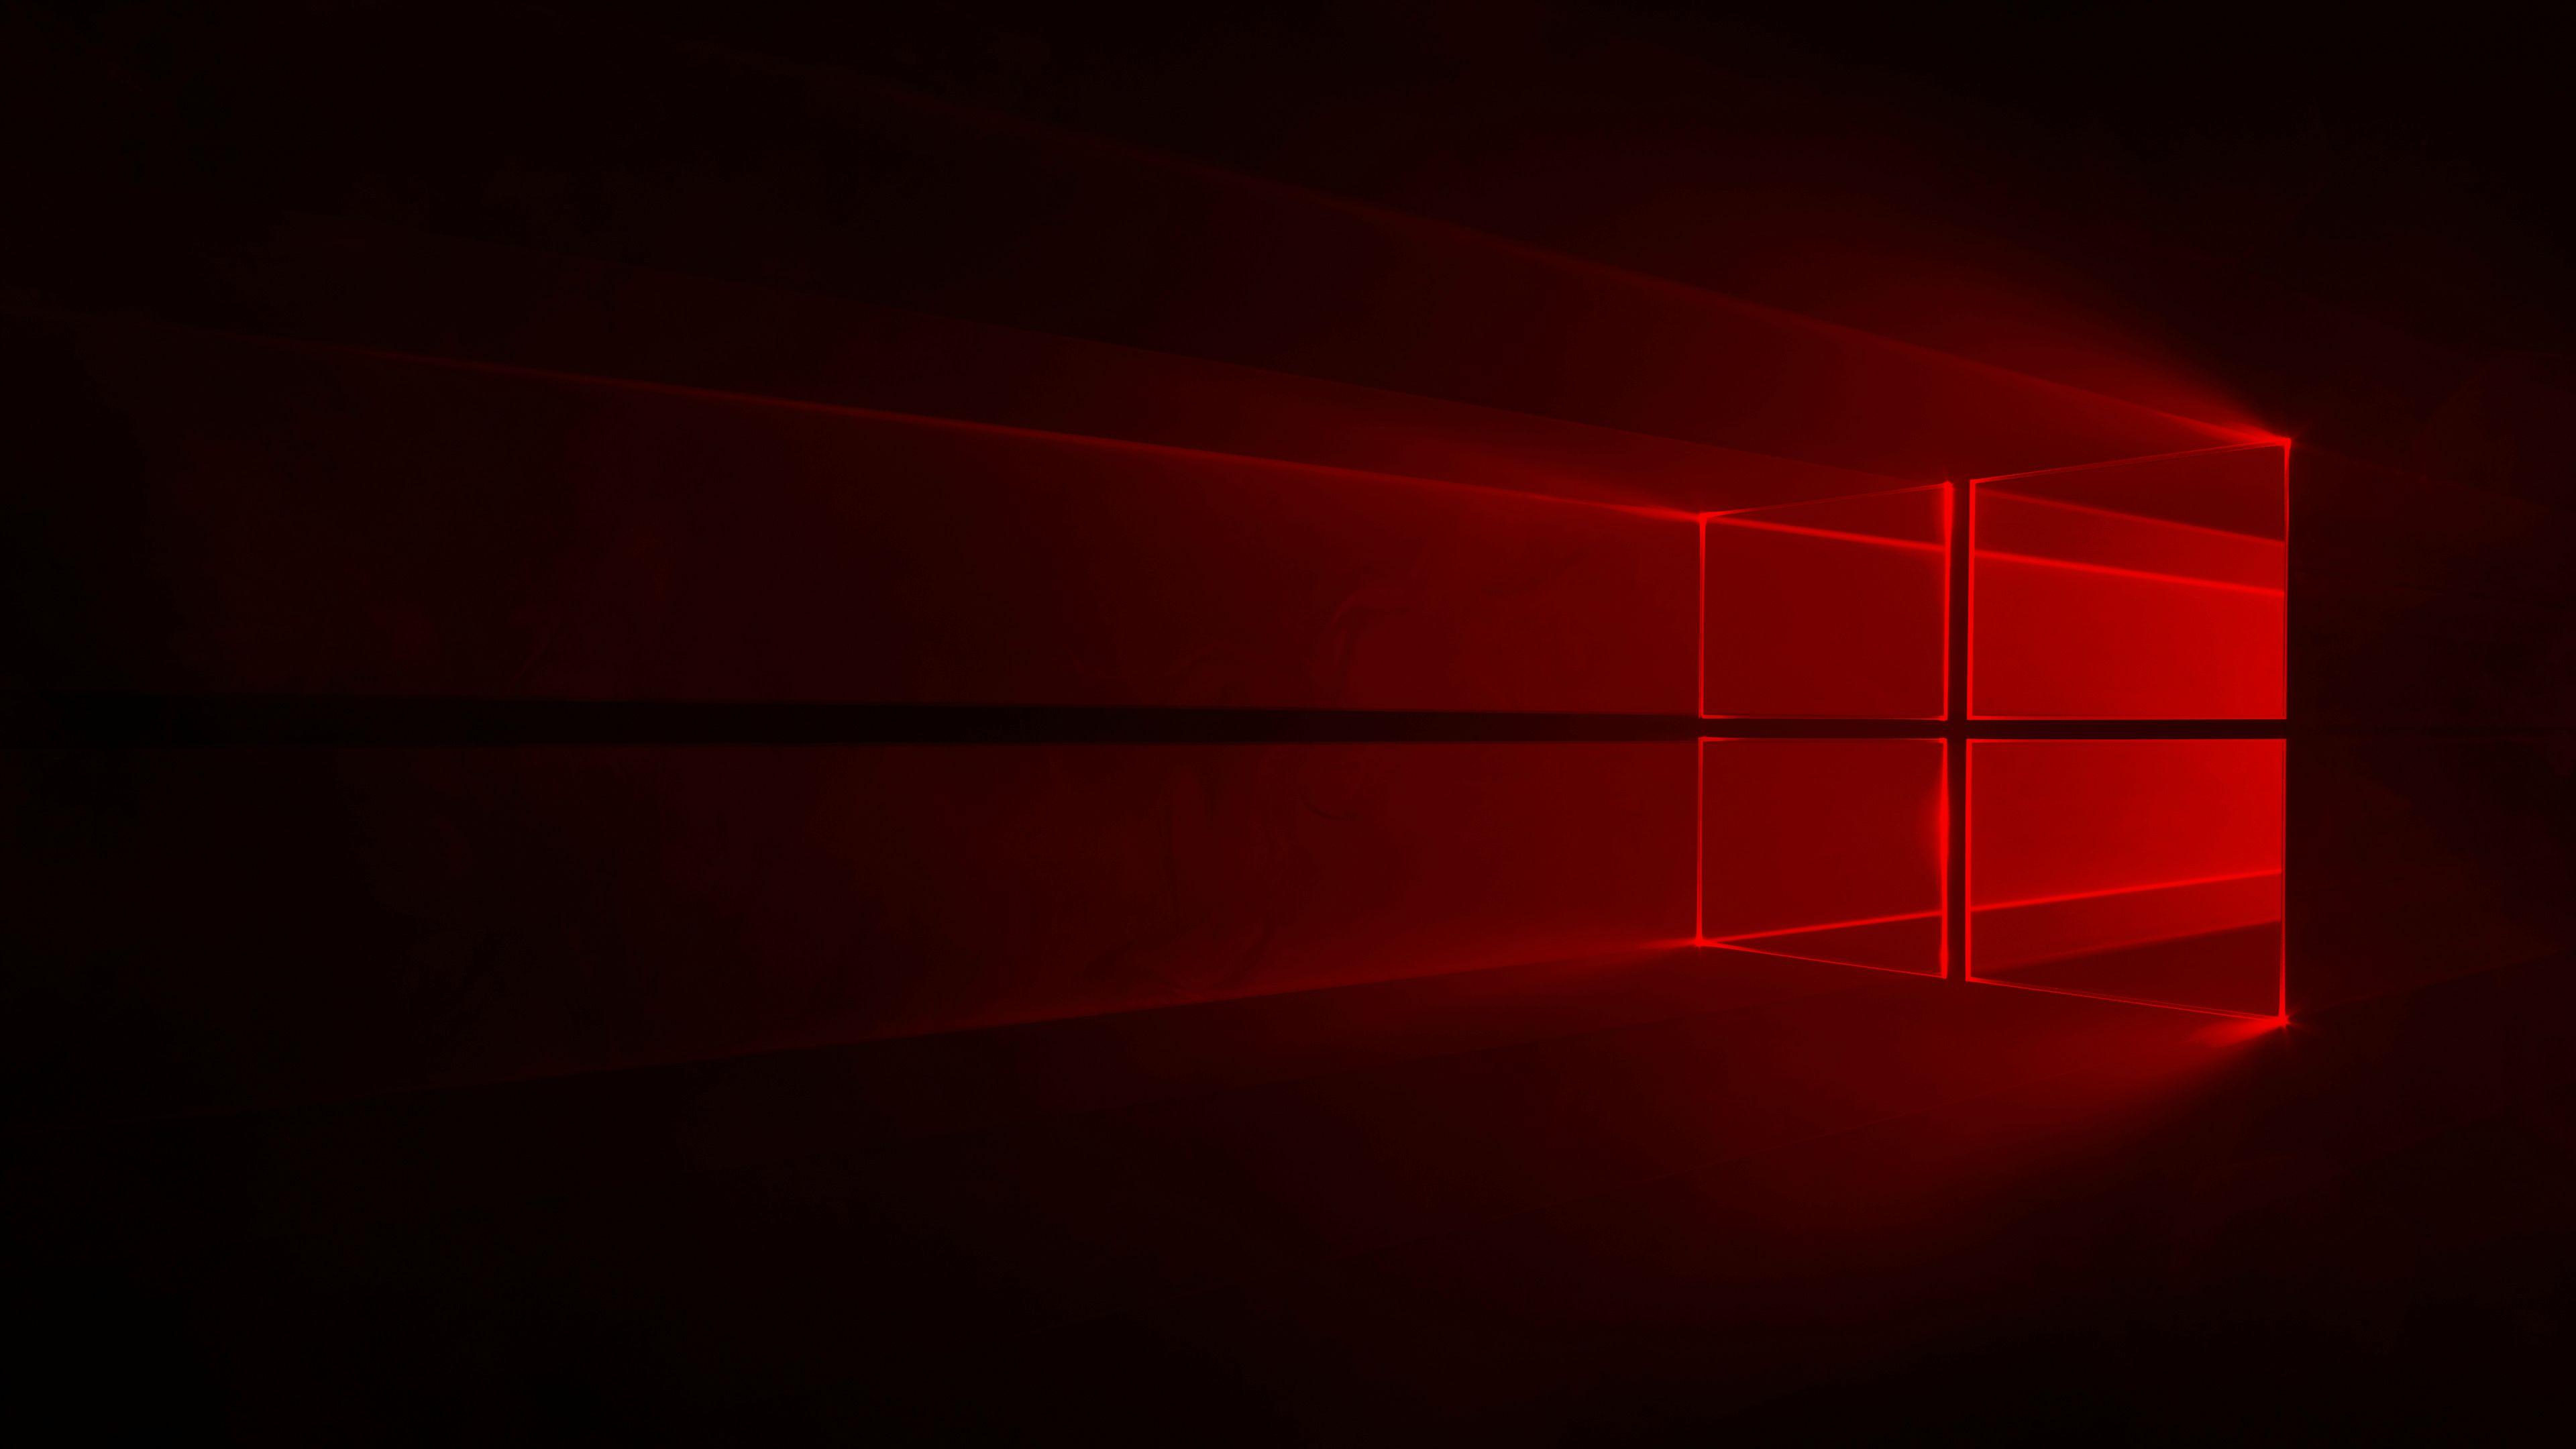 red windows wallpaper - sf wallpaper